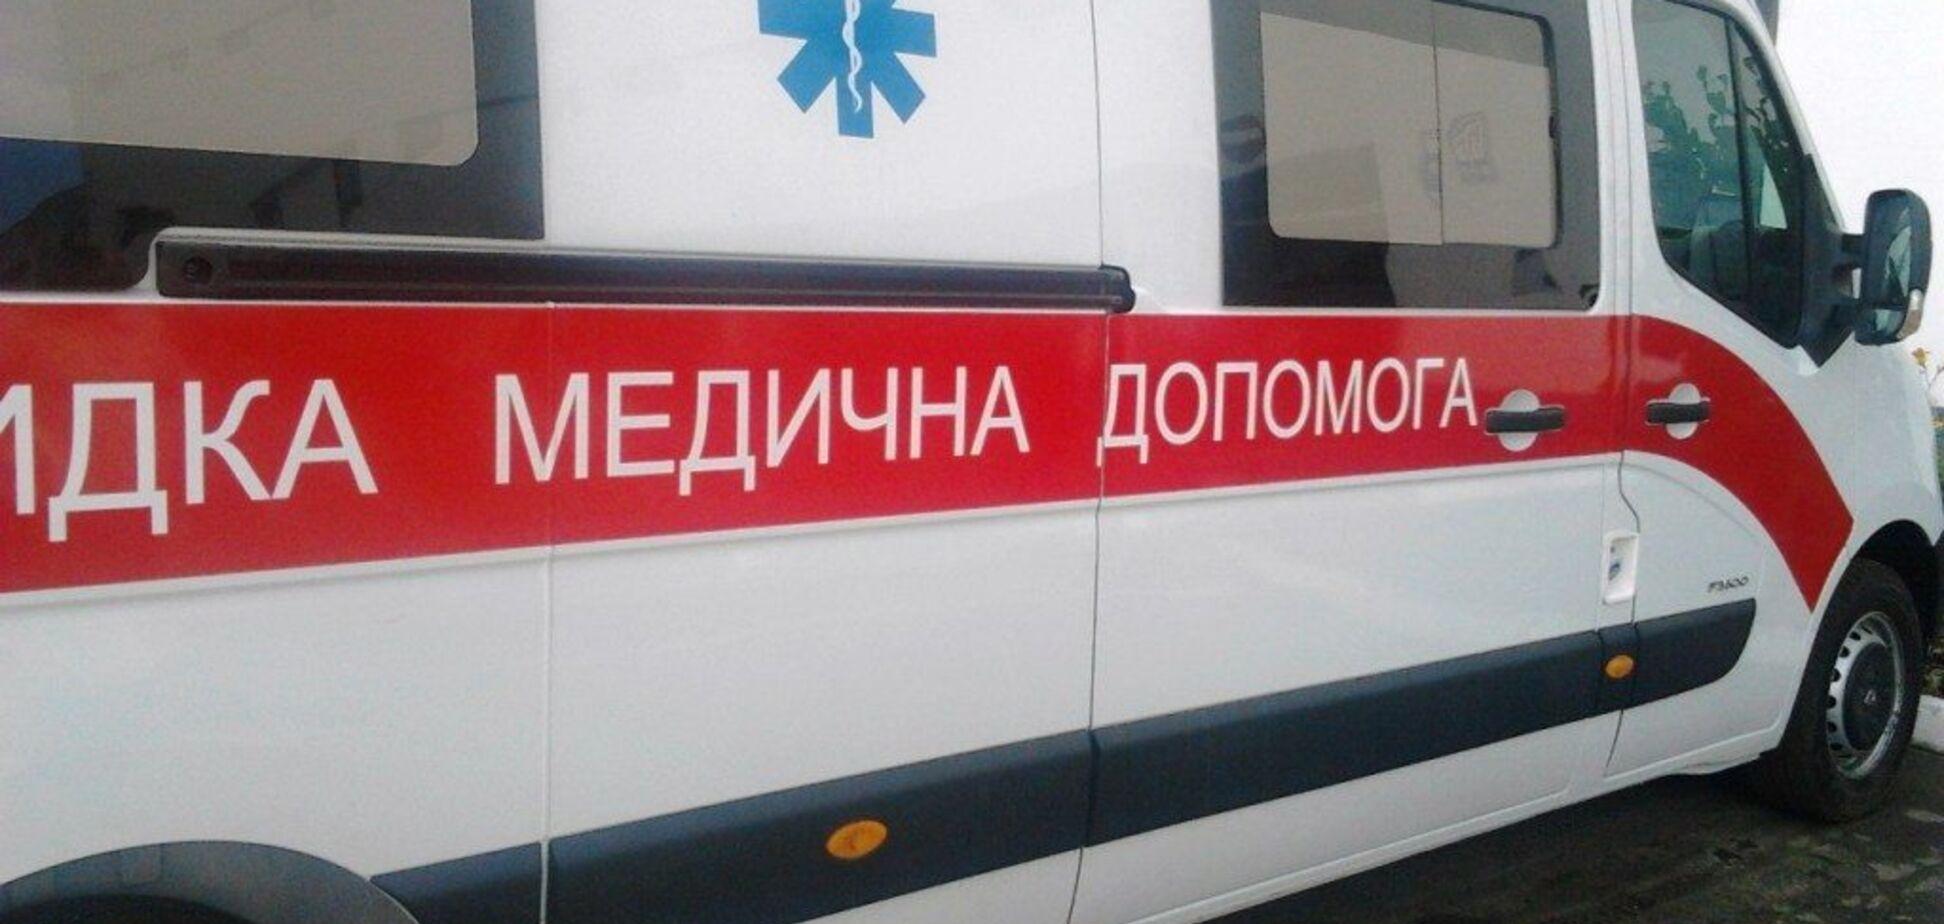 Под Одессой BMW протаранил маршрутку с людьми: много пострадавших. Фото